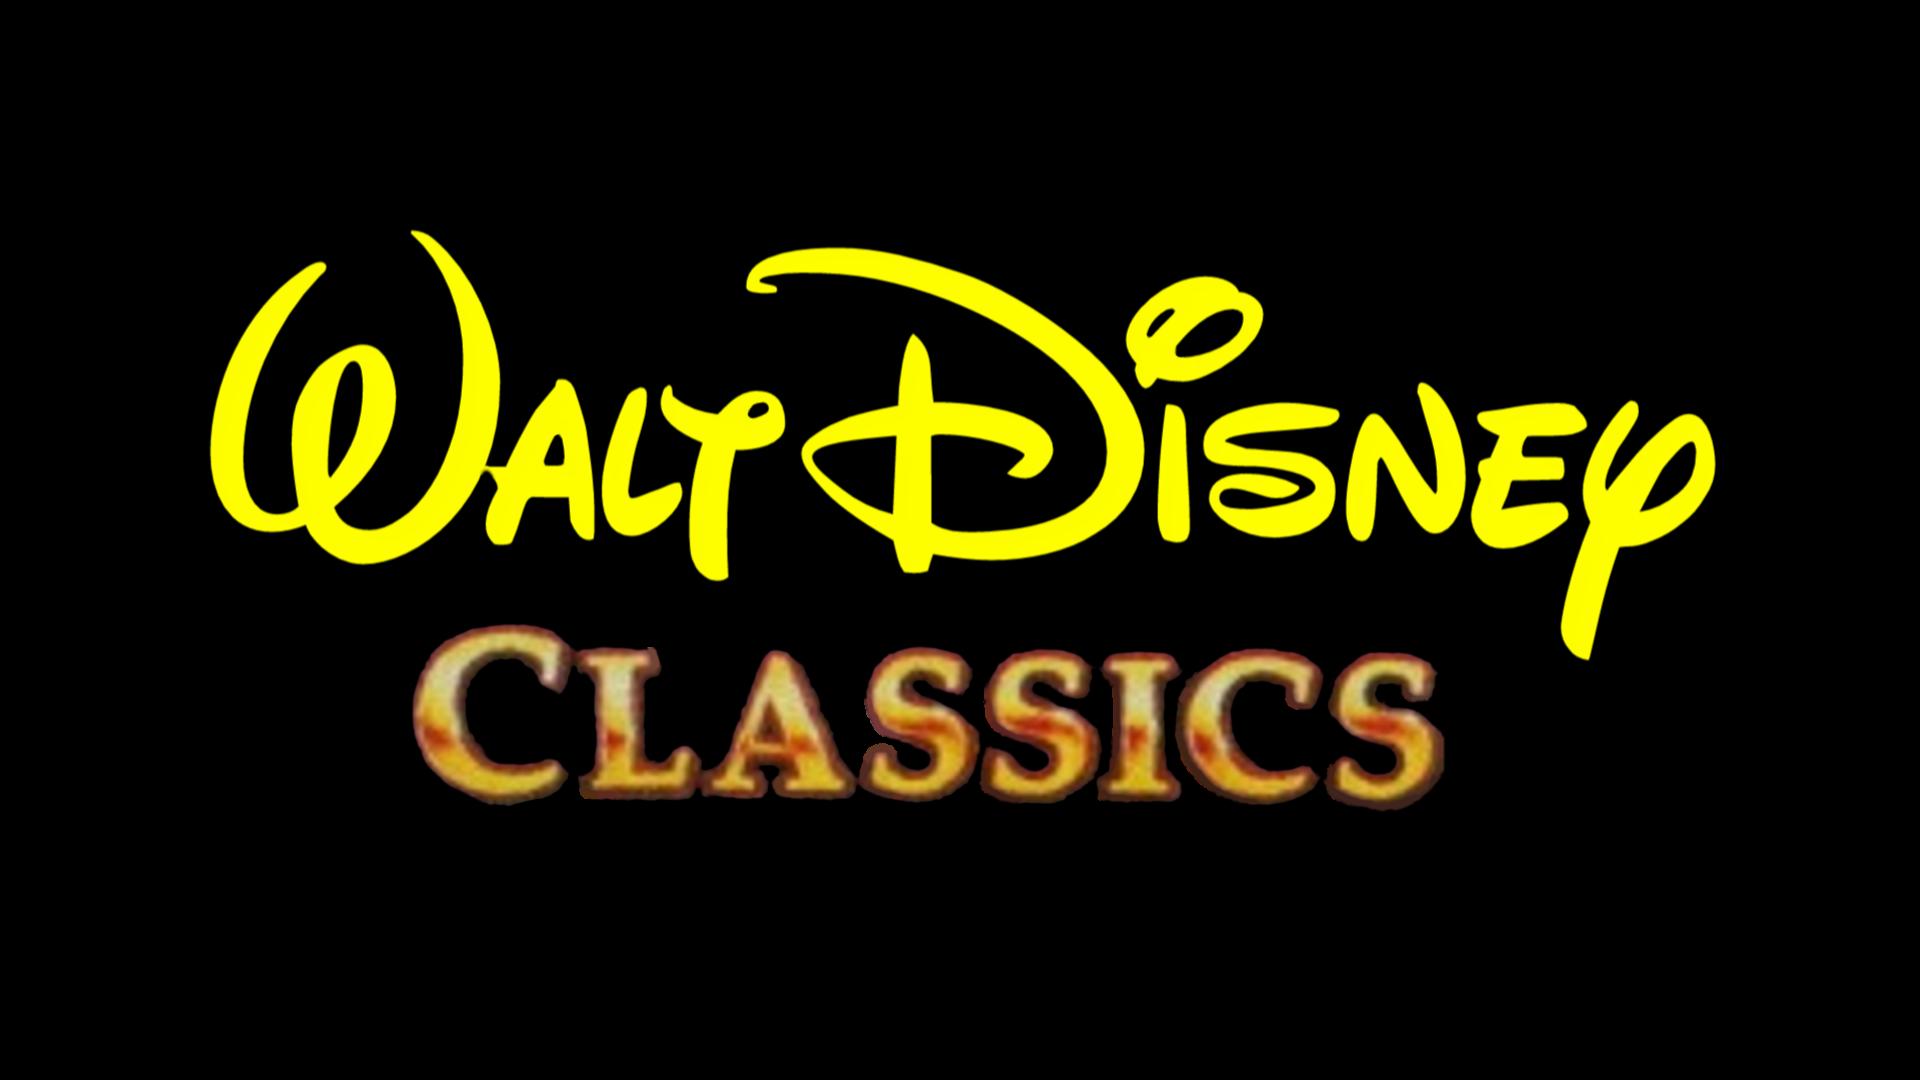 walt disney classics logos rh logolynx com